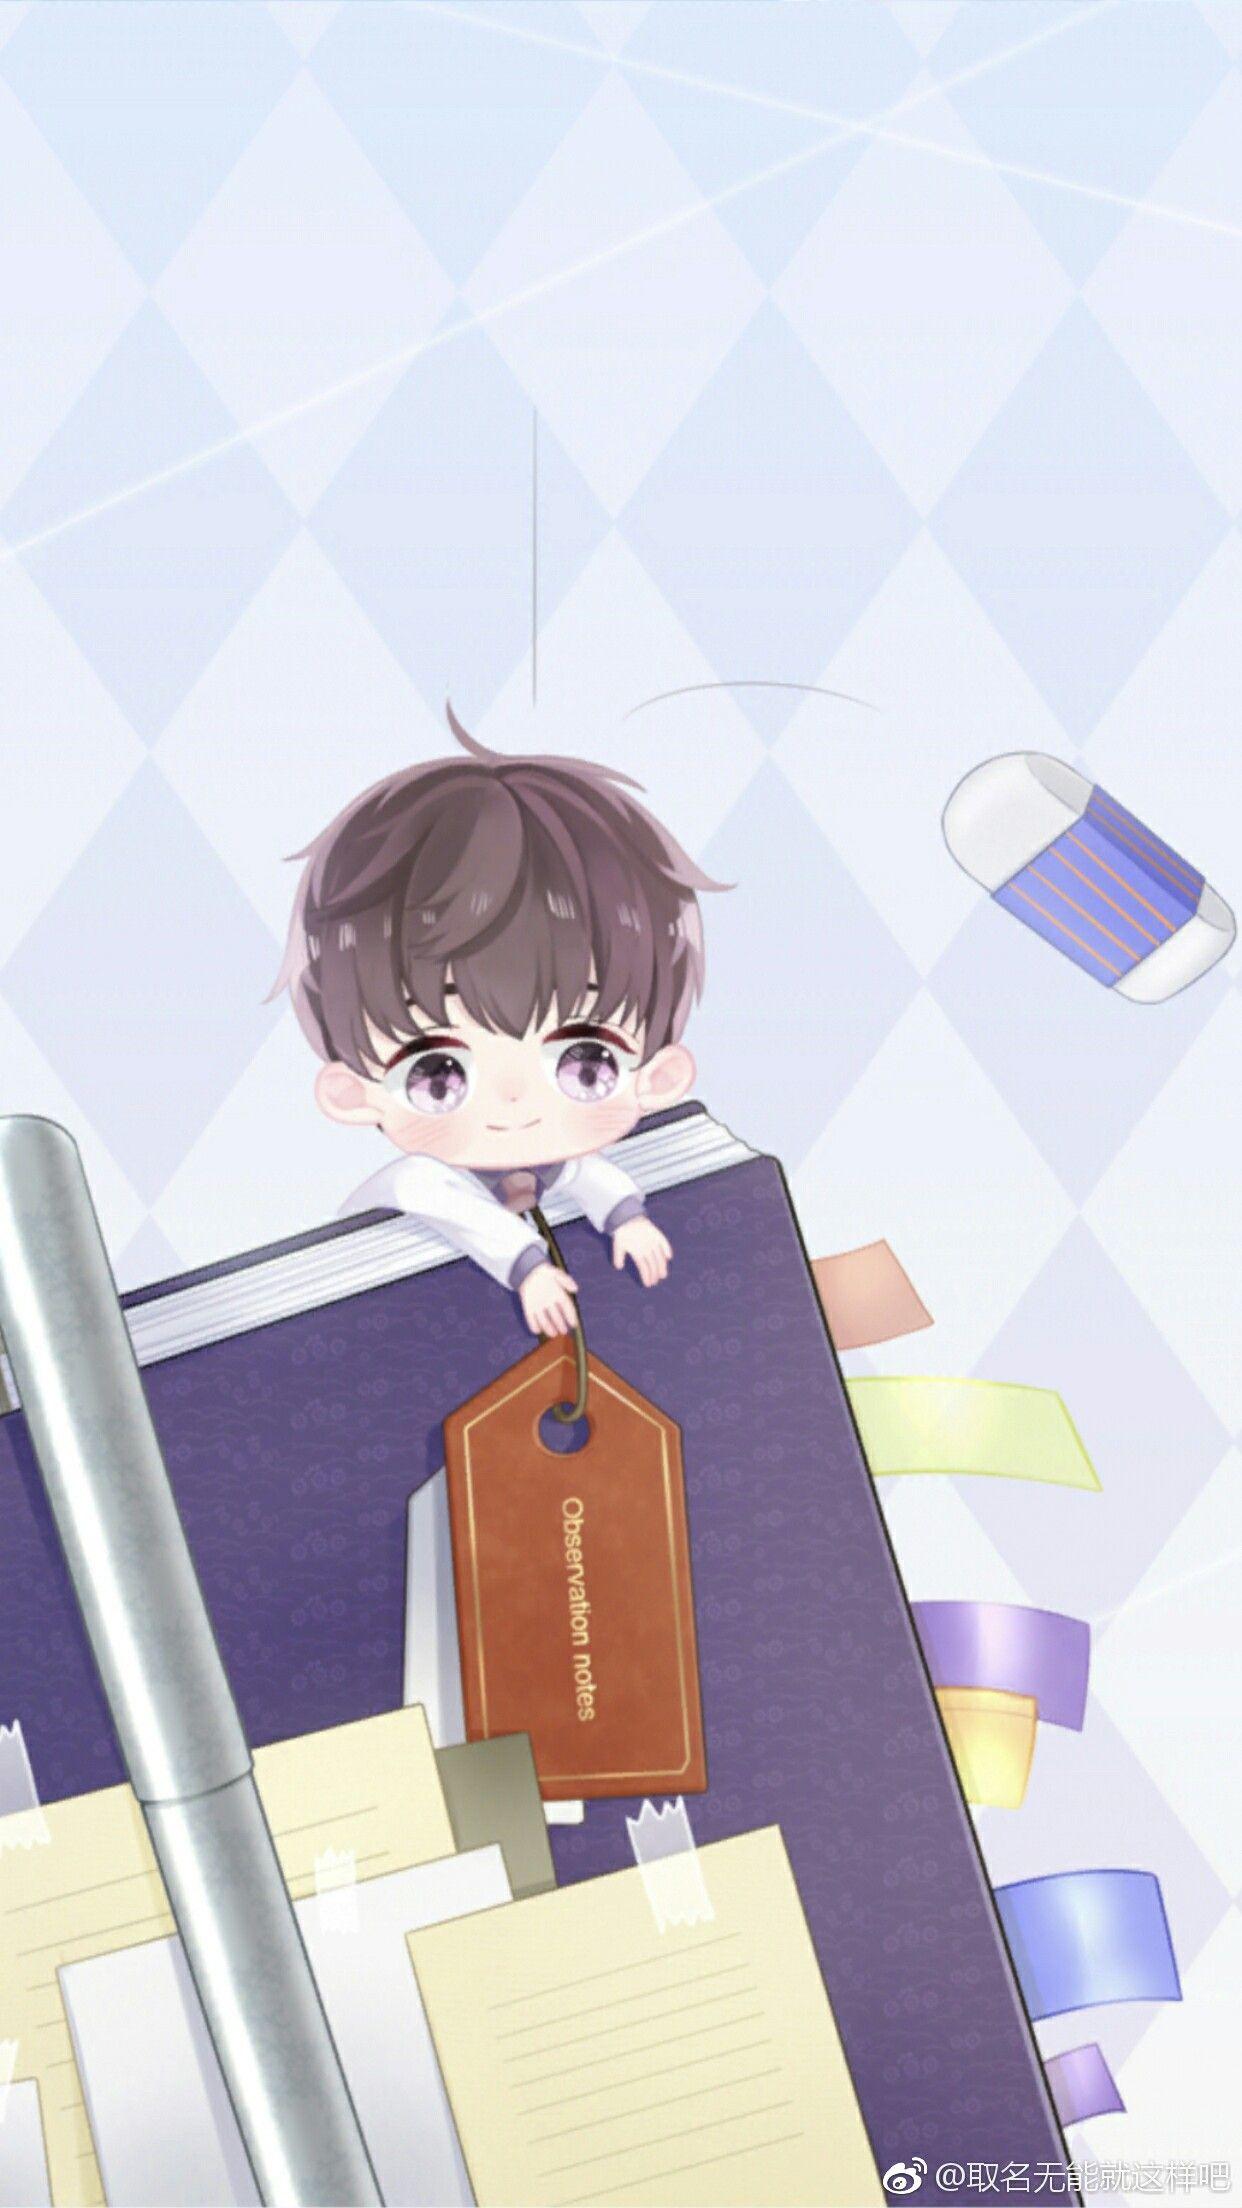 A chinese game called 恋与制作人 Cute anime boy, Cute chibi